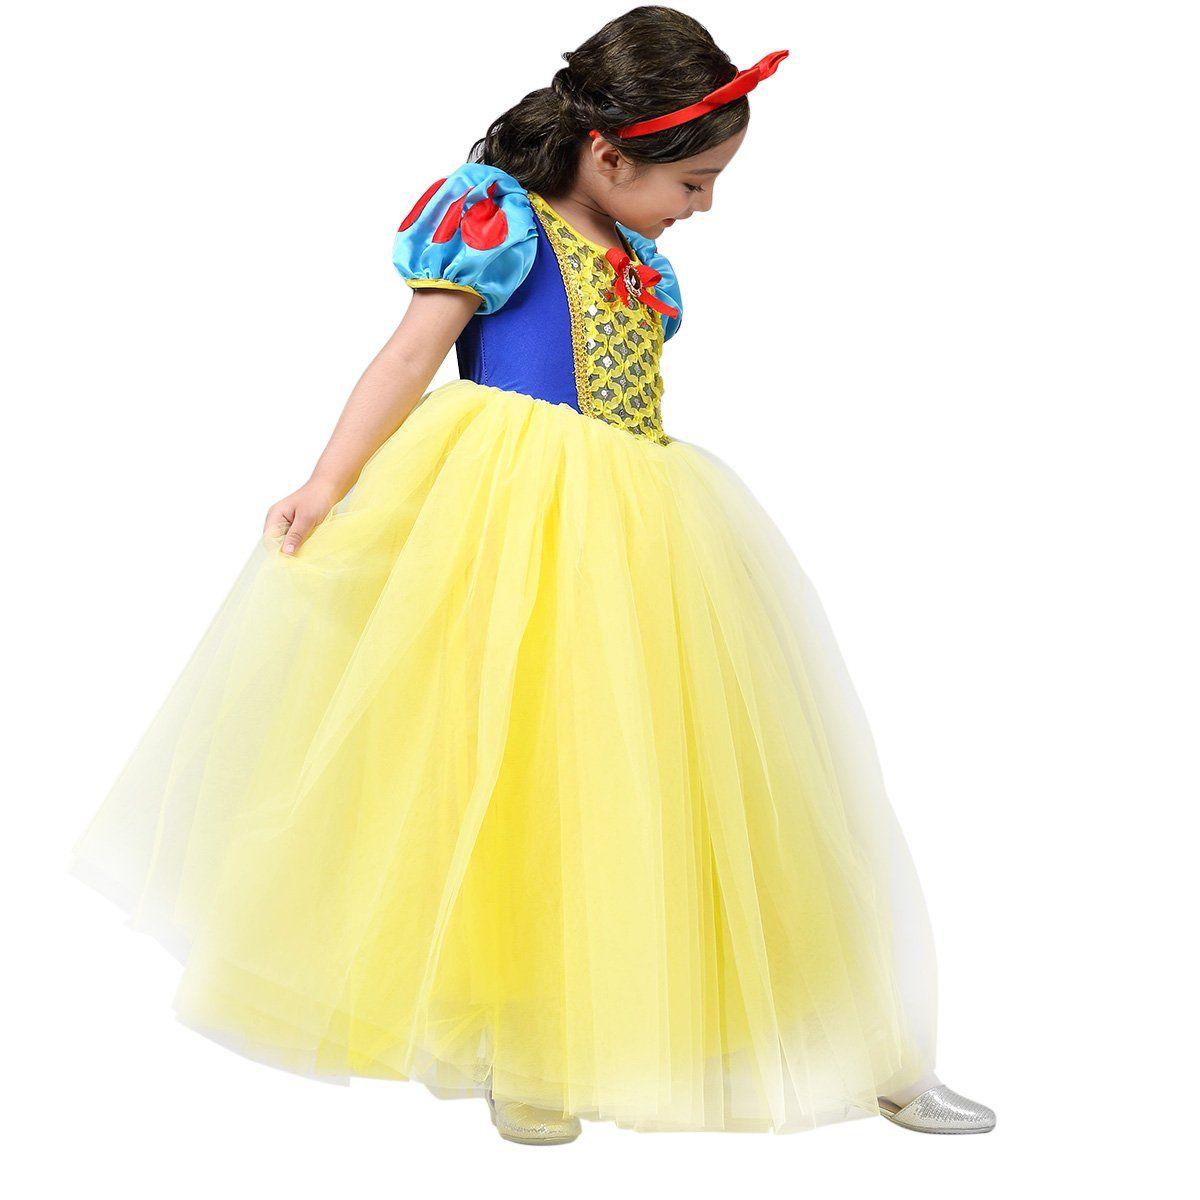 woman costumes for halloween kids > pamidadress girls snow white